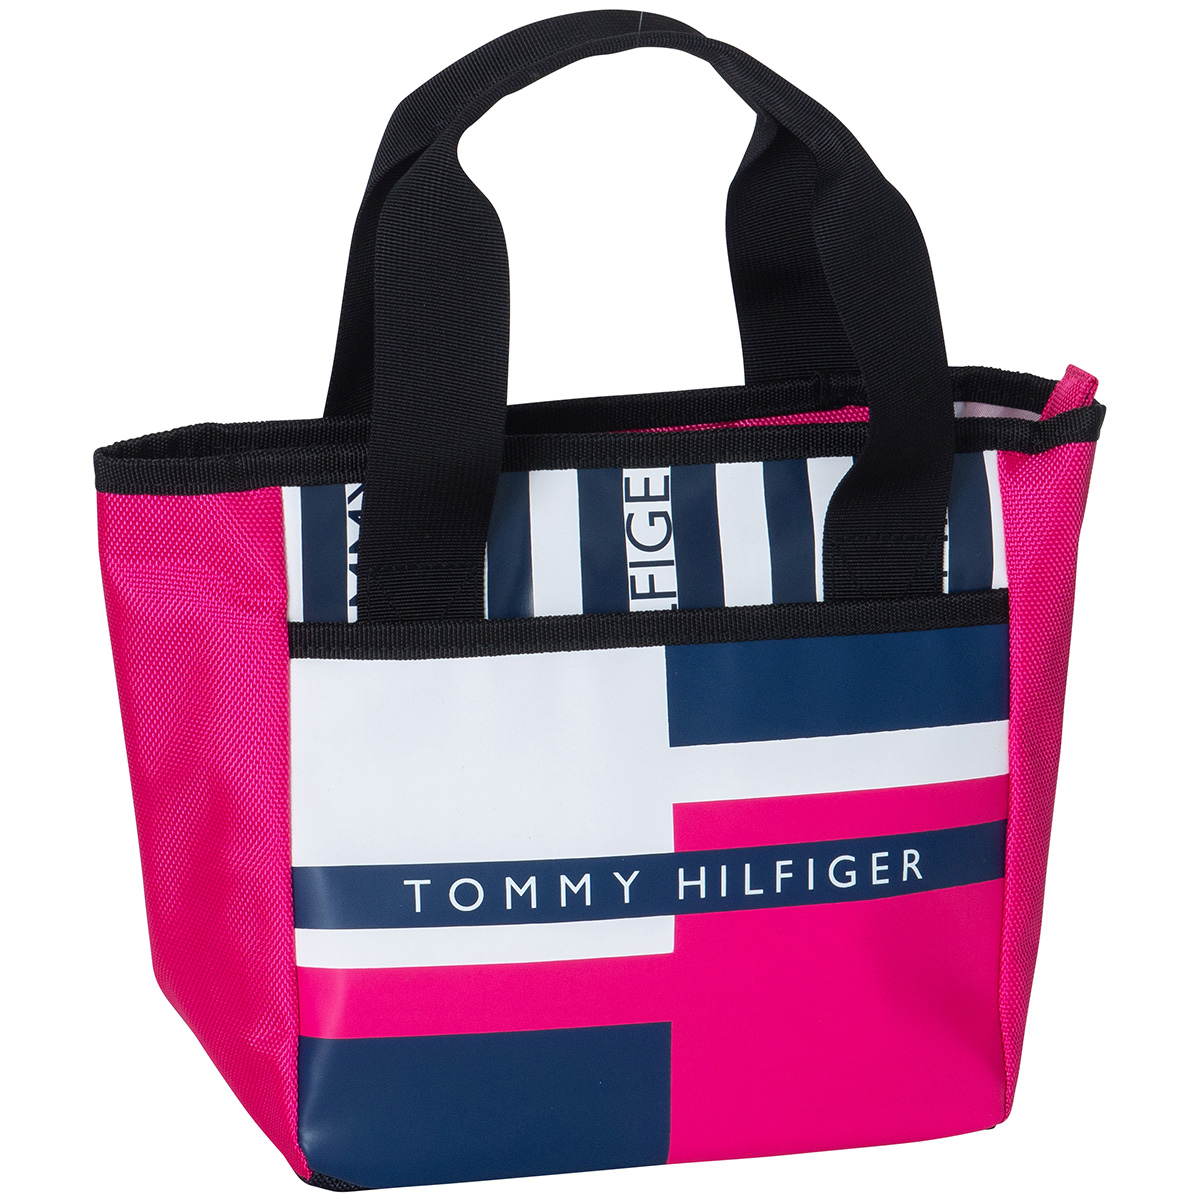 THE TOMMY ラウンドバッグ